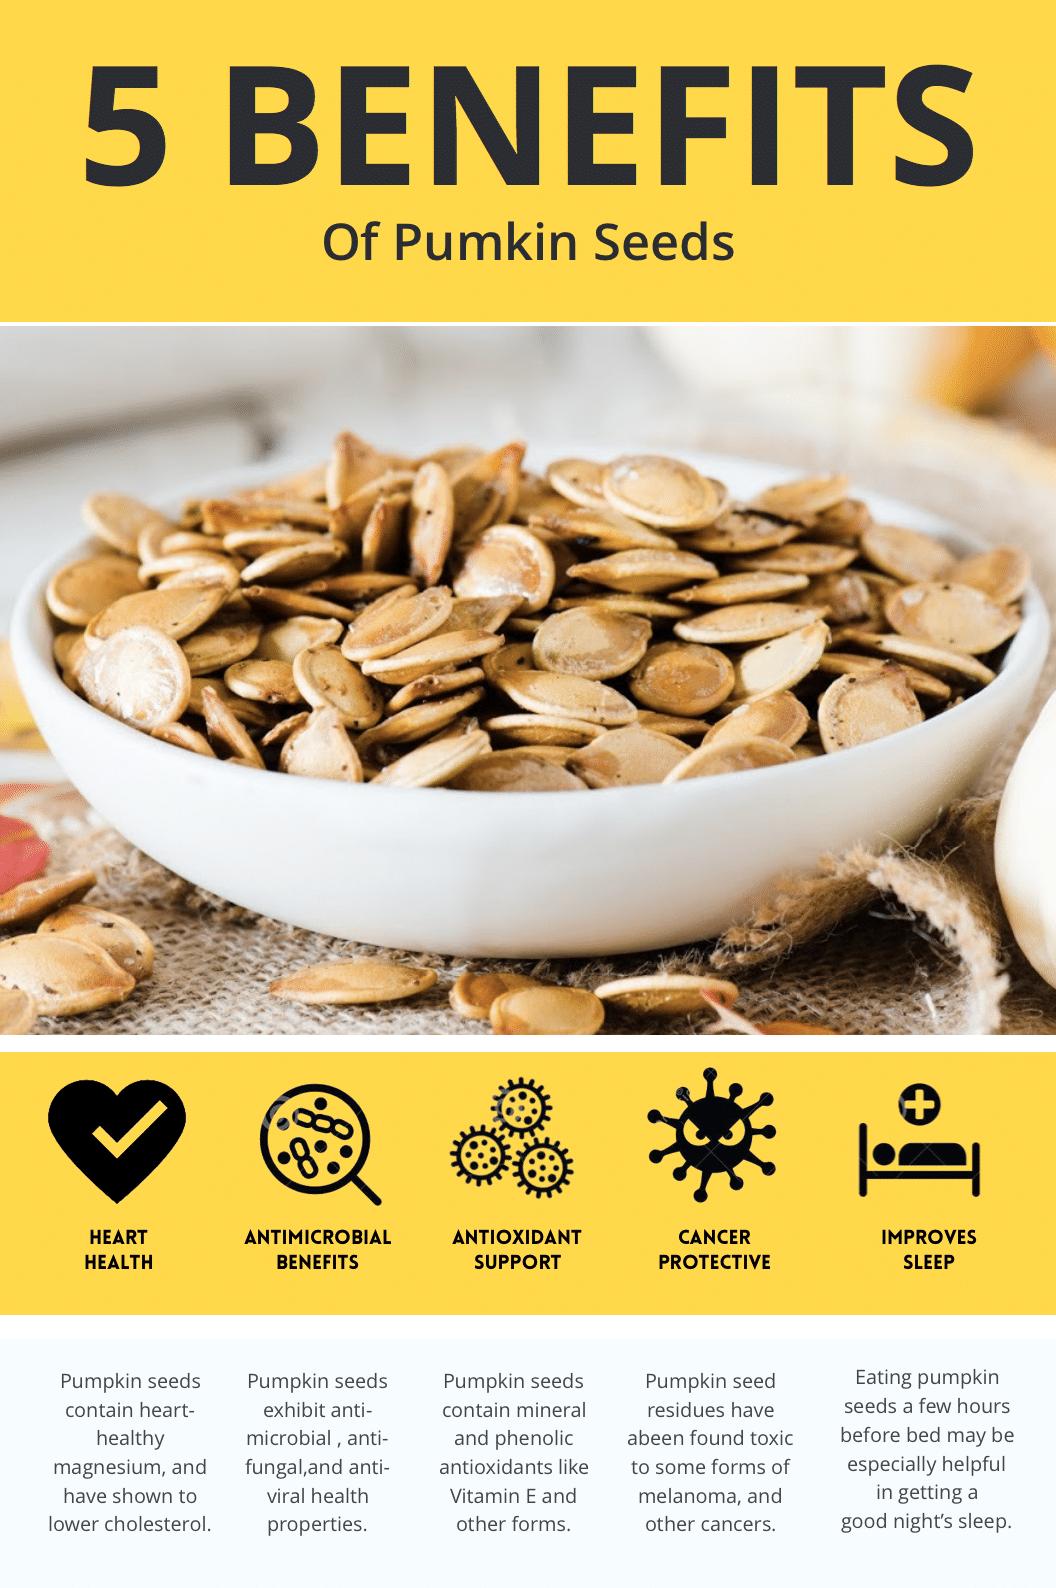 5 benefits of pumpkin seeds paleo and keto friendly